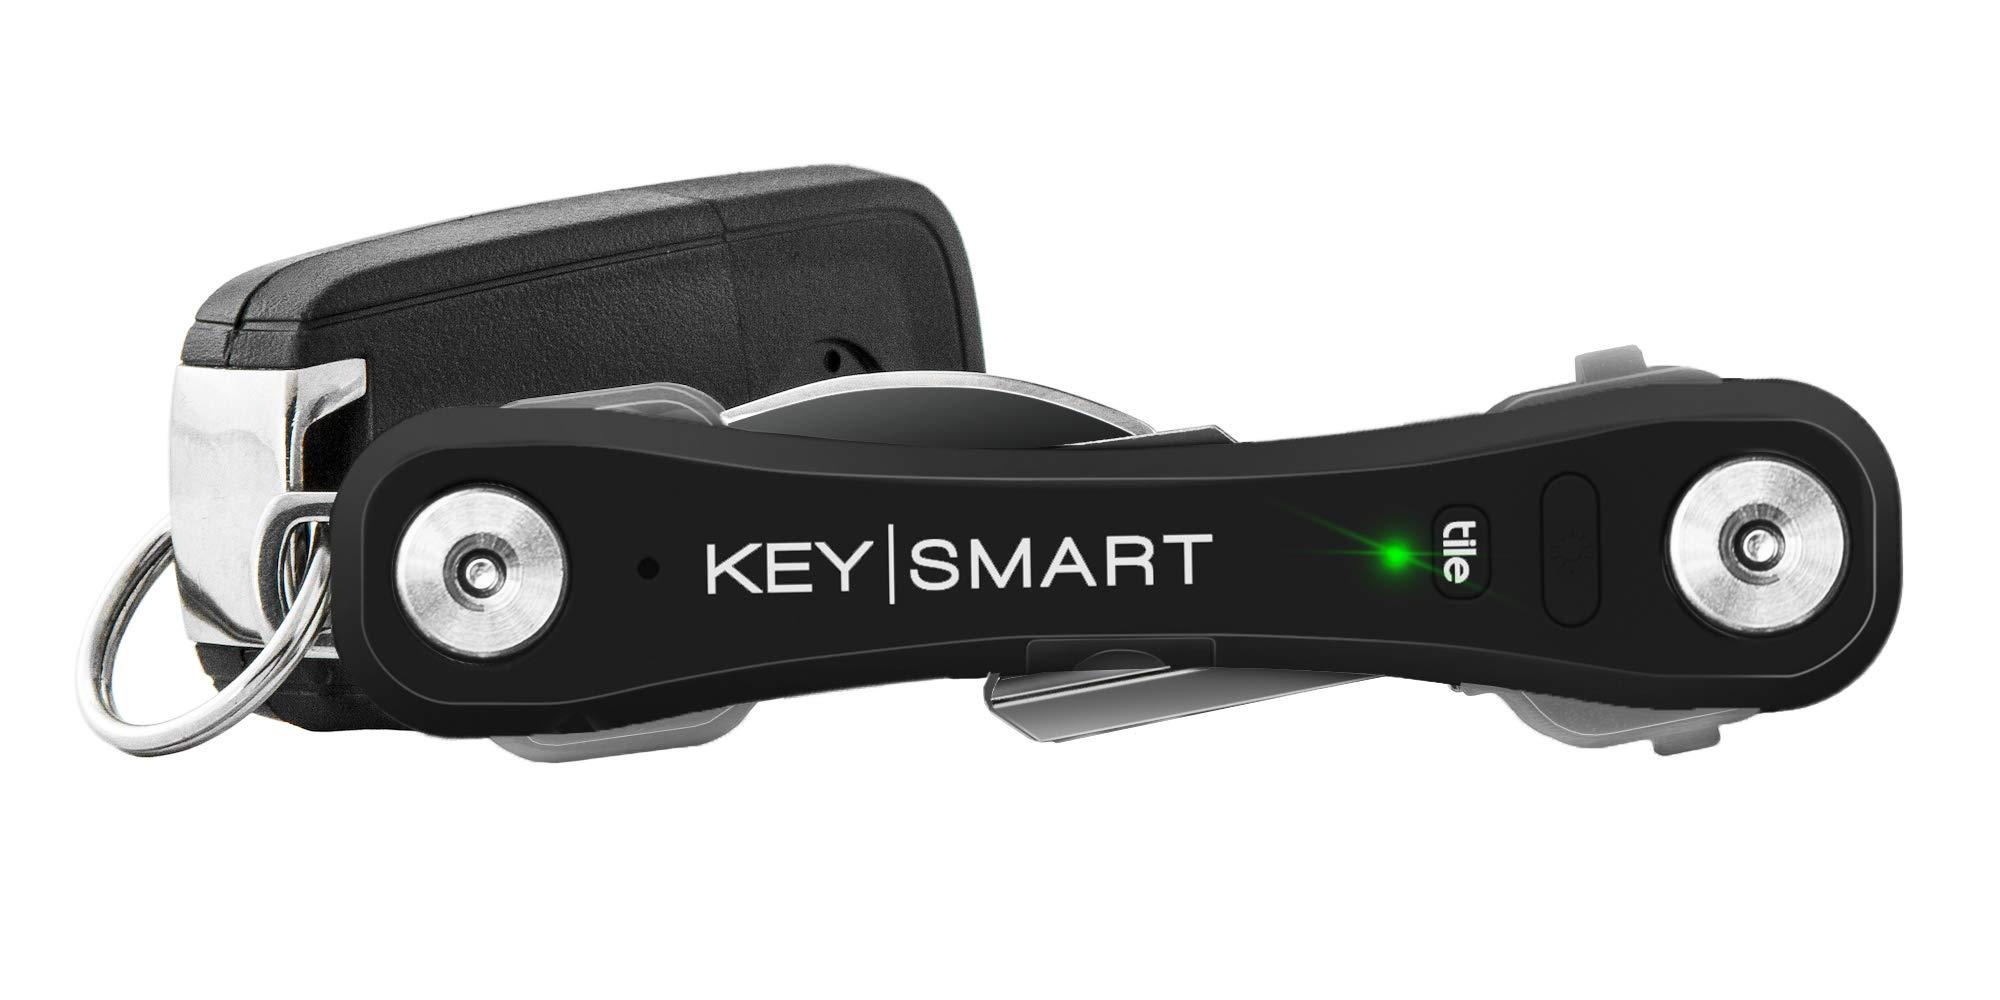 KeySmart Pro - Compact Key Holder w LED Light & Tile Smart Technology, Track Your Lost Keys & Phone w Bluetooth (up to 10 Keys, Black) by KeySmart